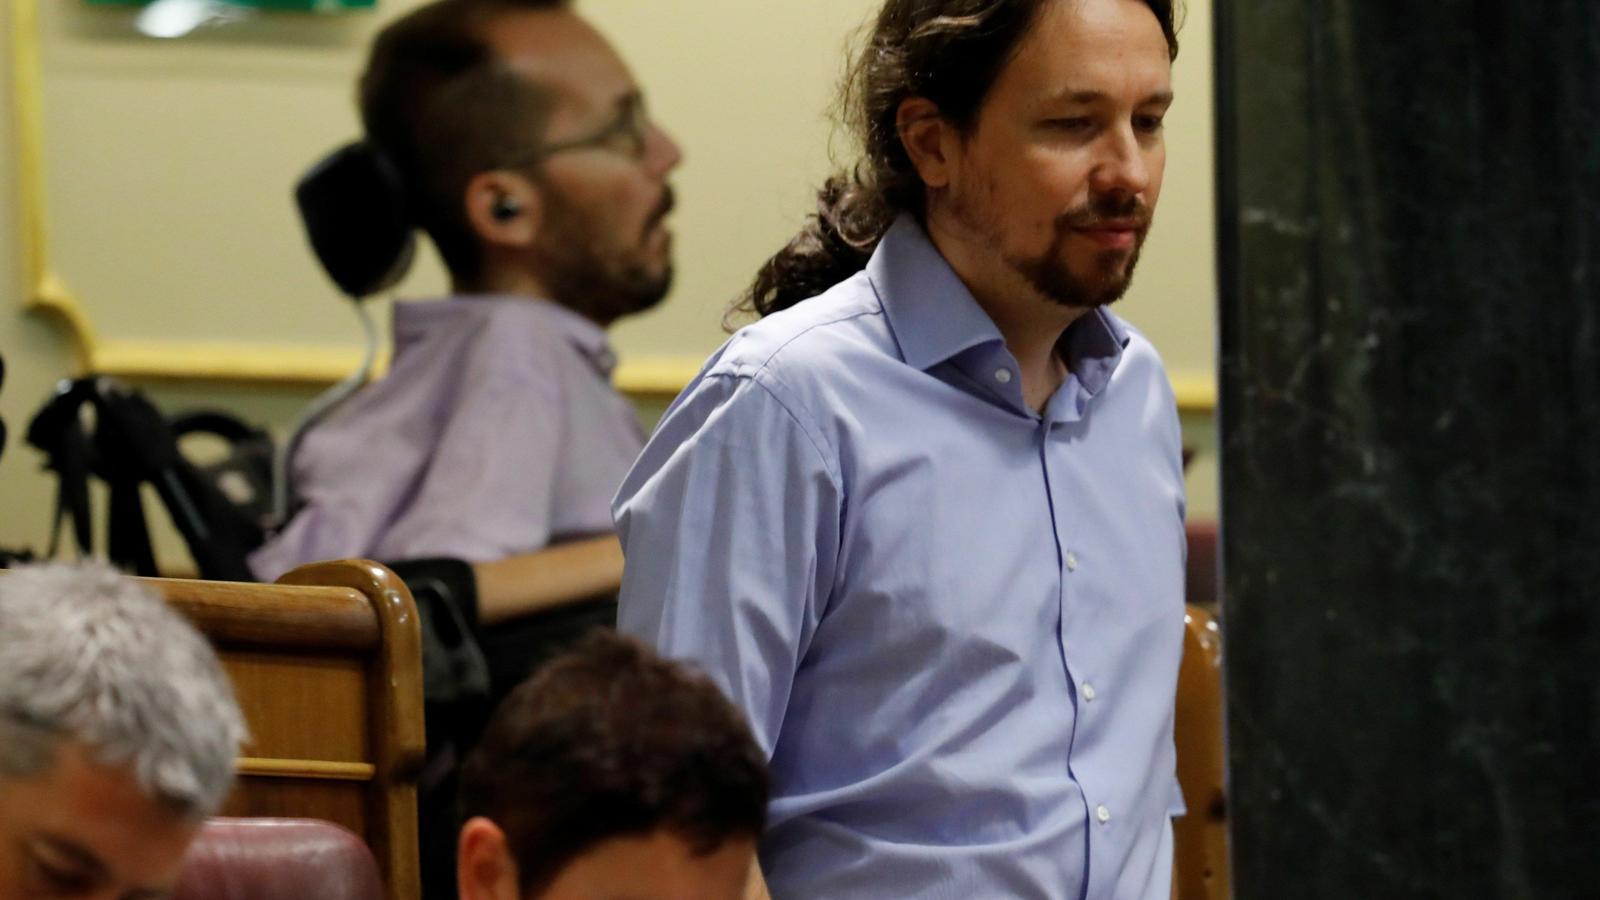 Pablo Echenique i Pablo Iglesias, diputats de Podem, aquest dimarts al Congrés.